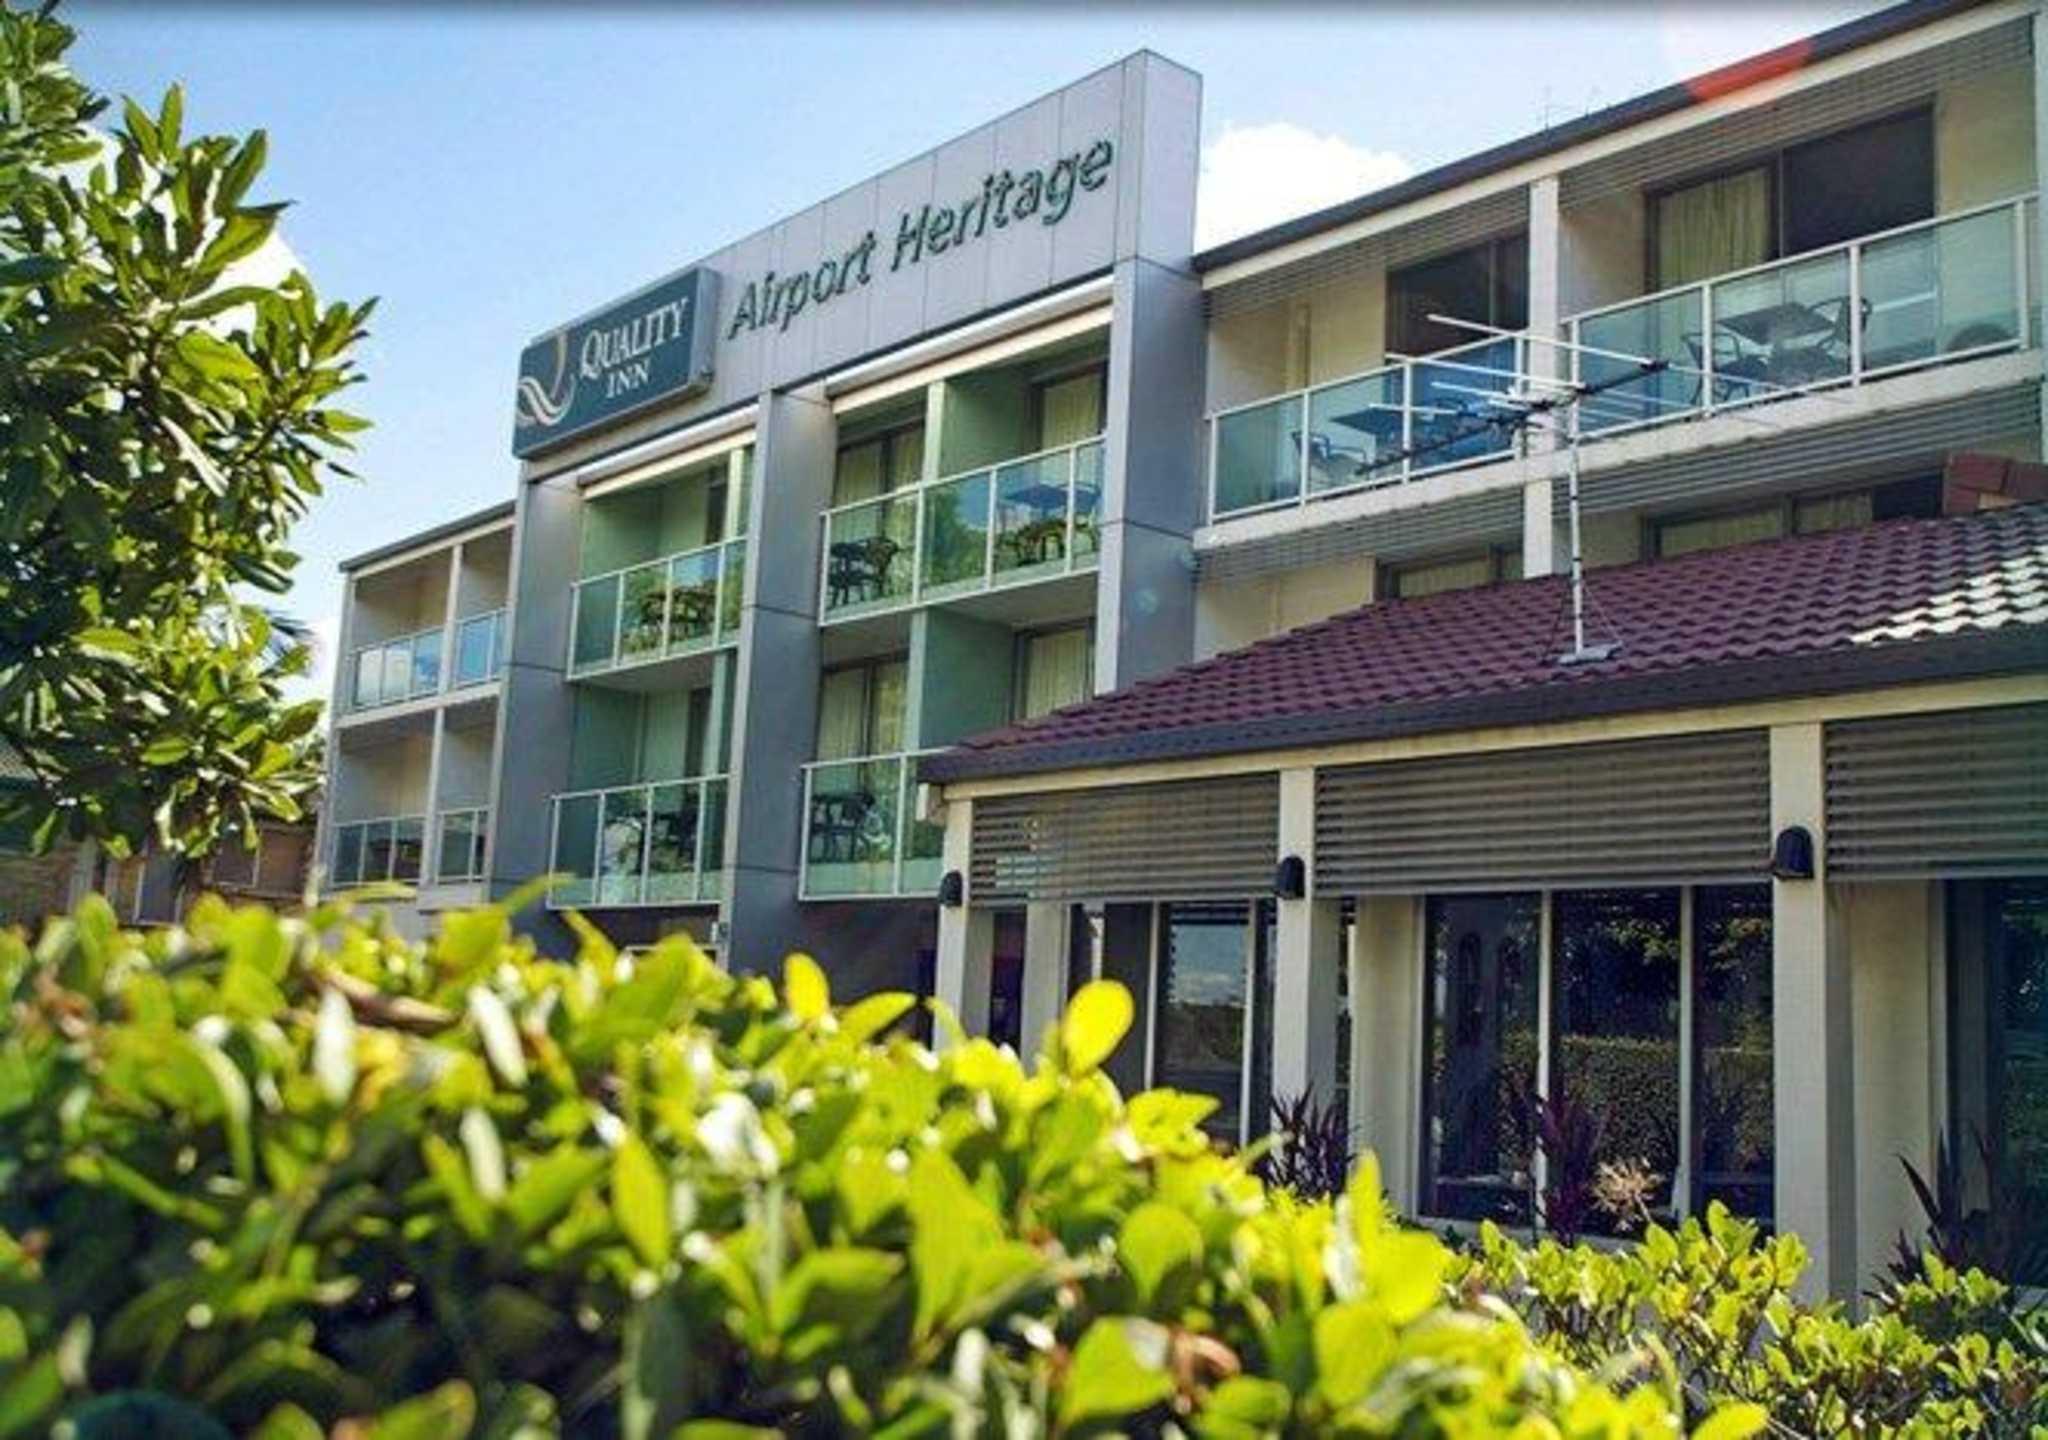 Quality Inn Airport Heritage - Brisbane, QLD 4007 - (07) 3268 5899 | ShowMeLocal.com